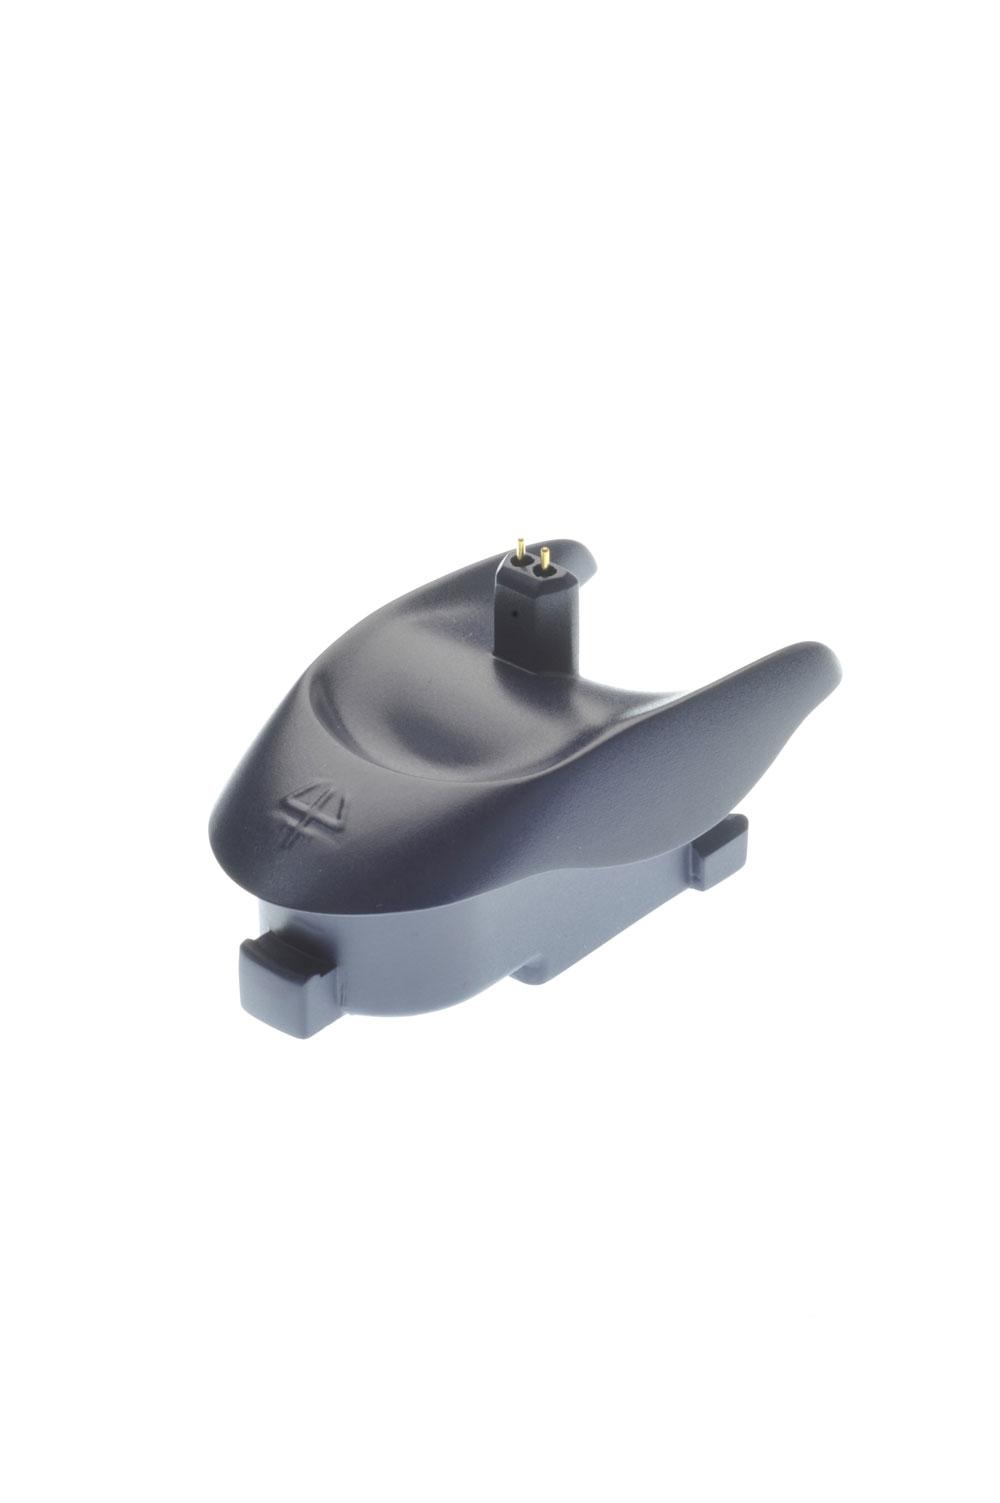 F807023_MAIN_Pipetman-M-Charging-Adapter.jpg